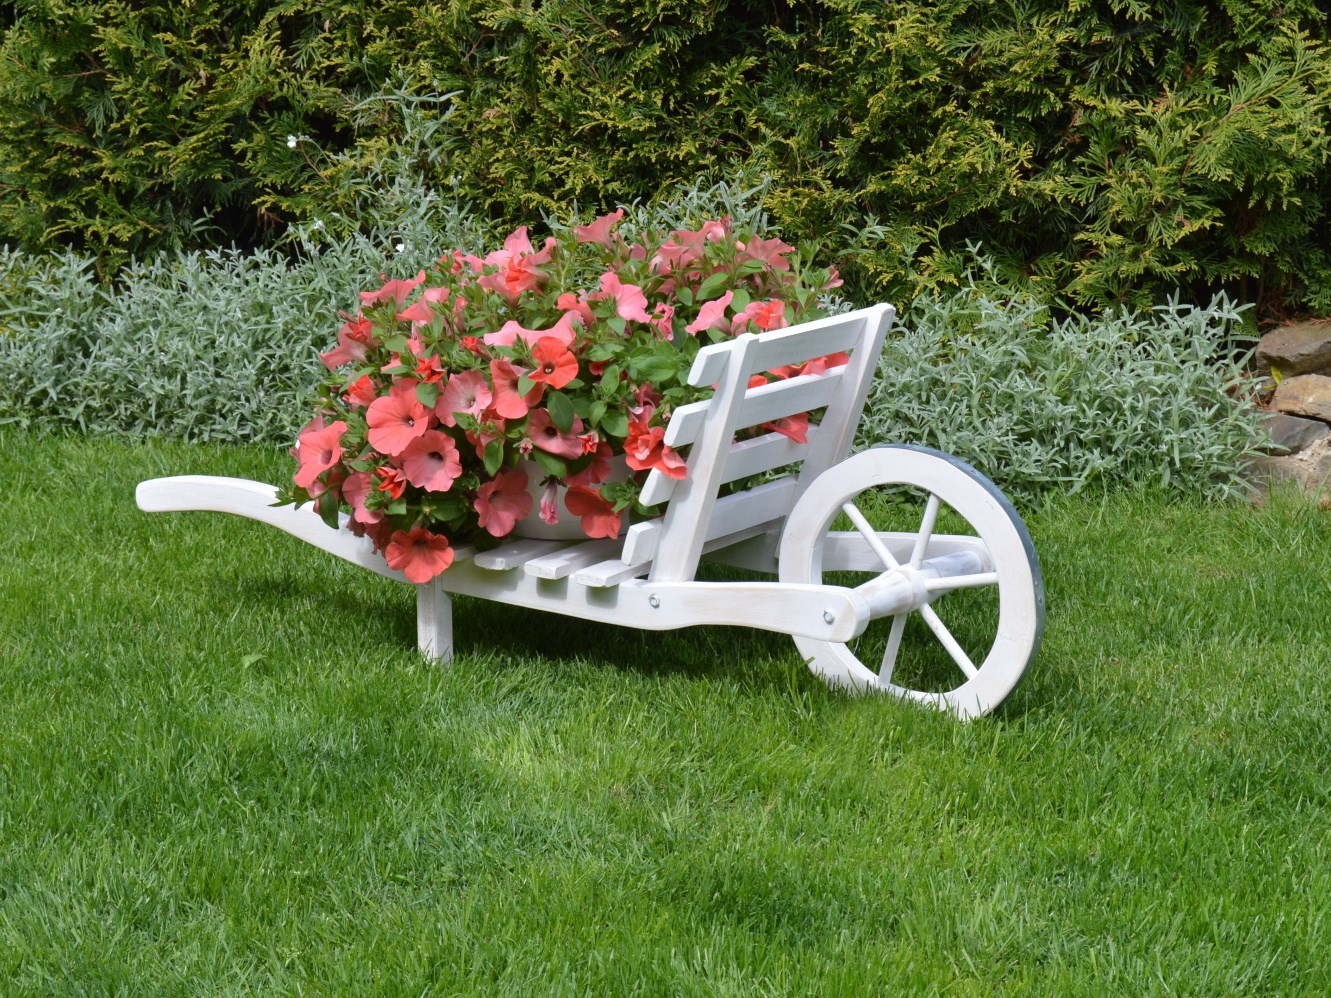 Trakař na zahradu